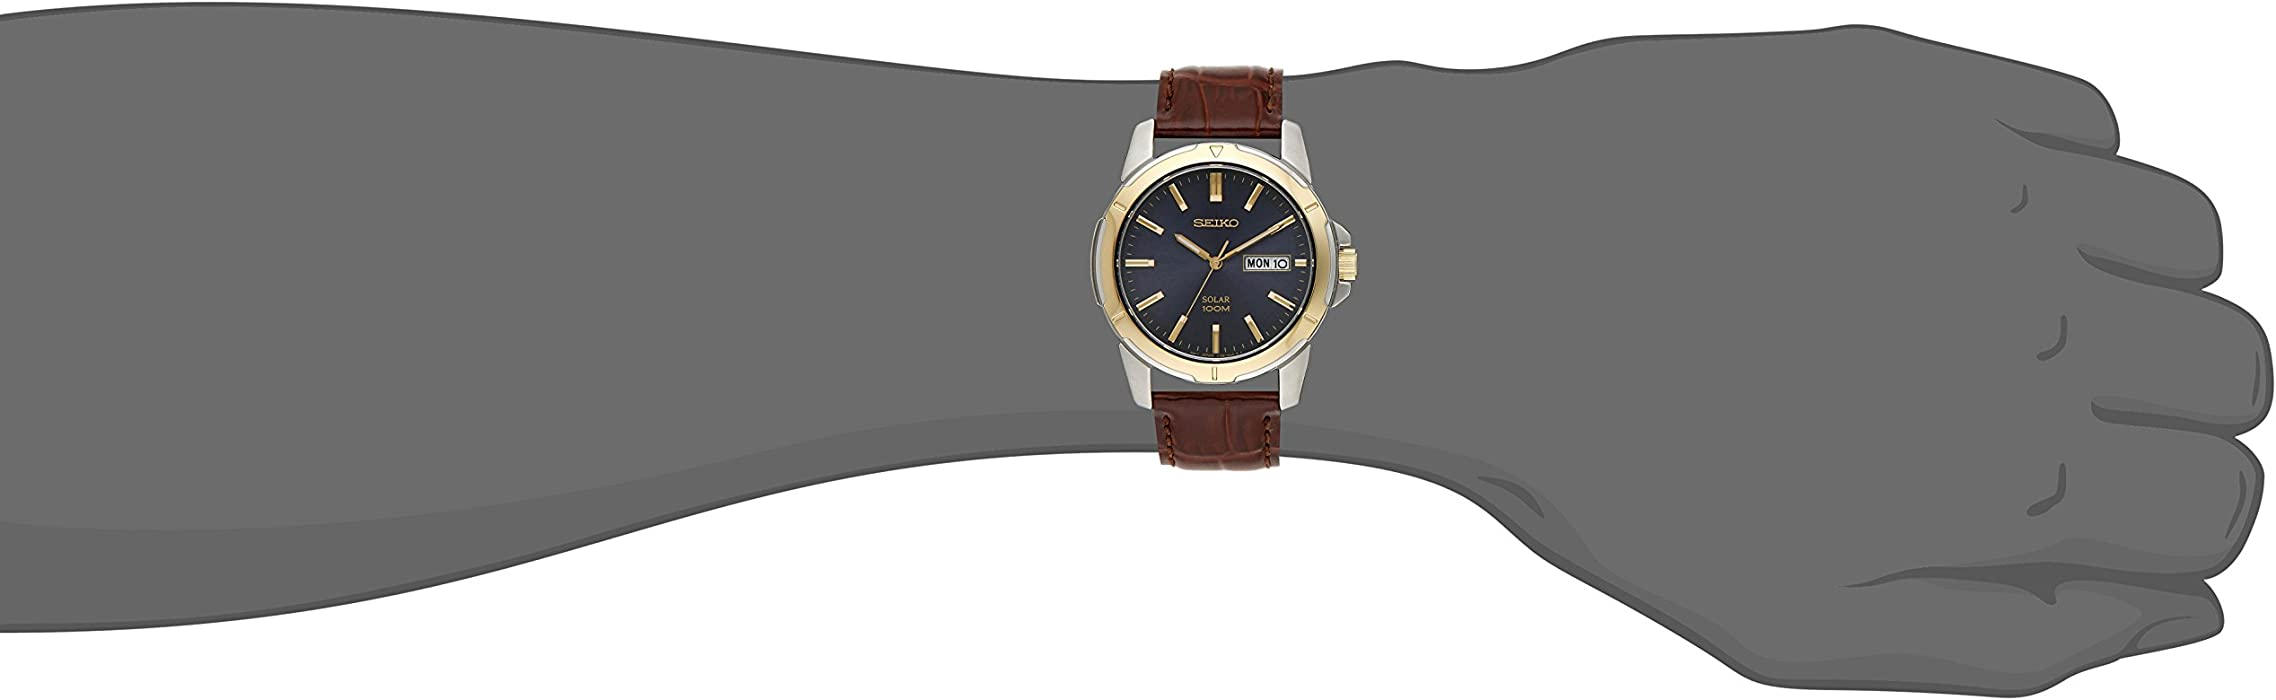 Seiko Men TwoTone Leather Strap Blue Dial Solar Watch